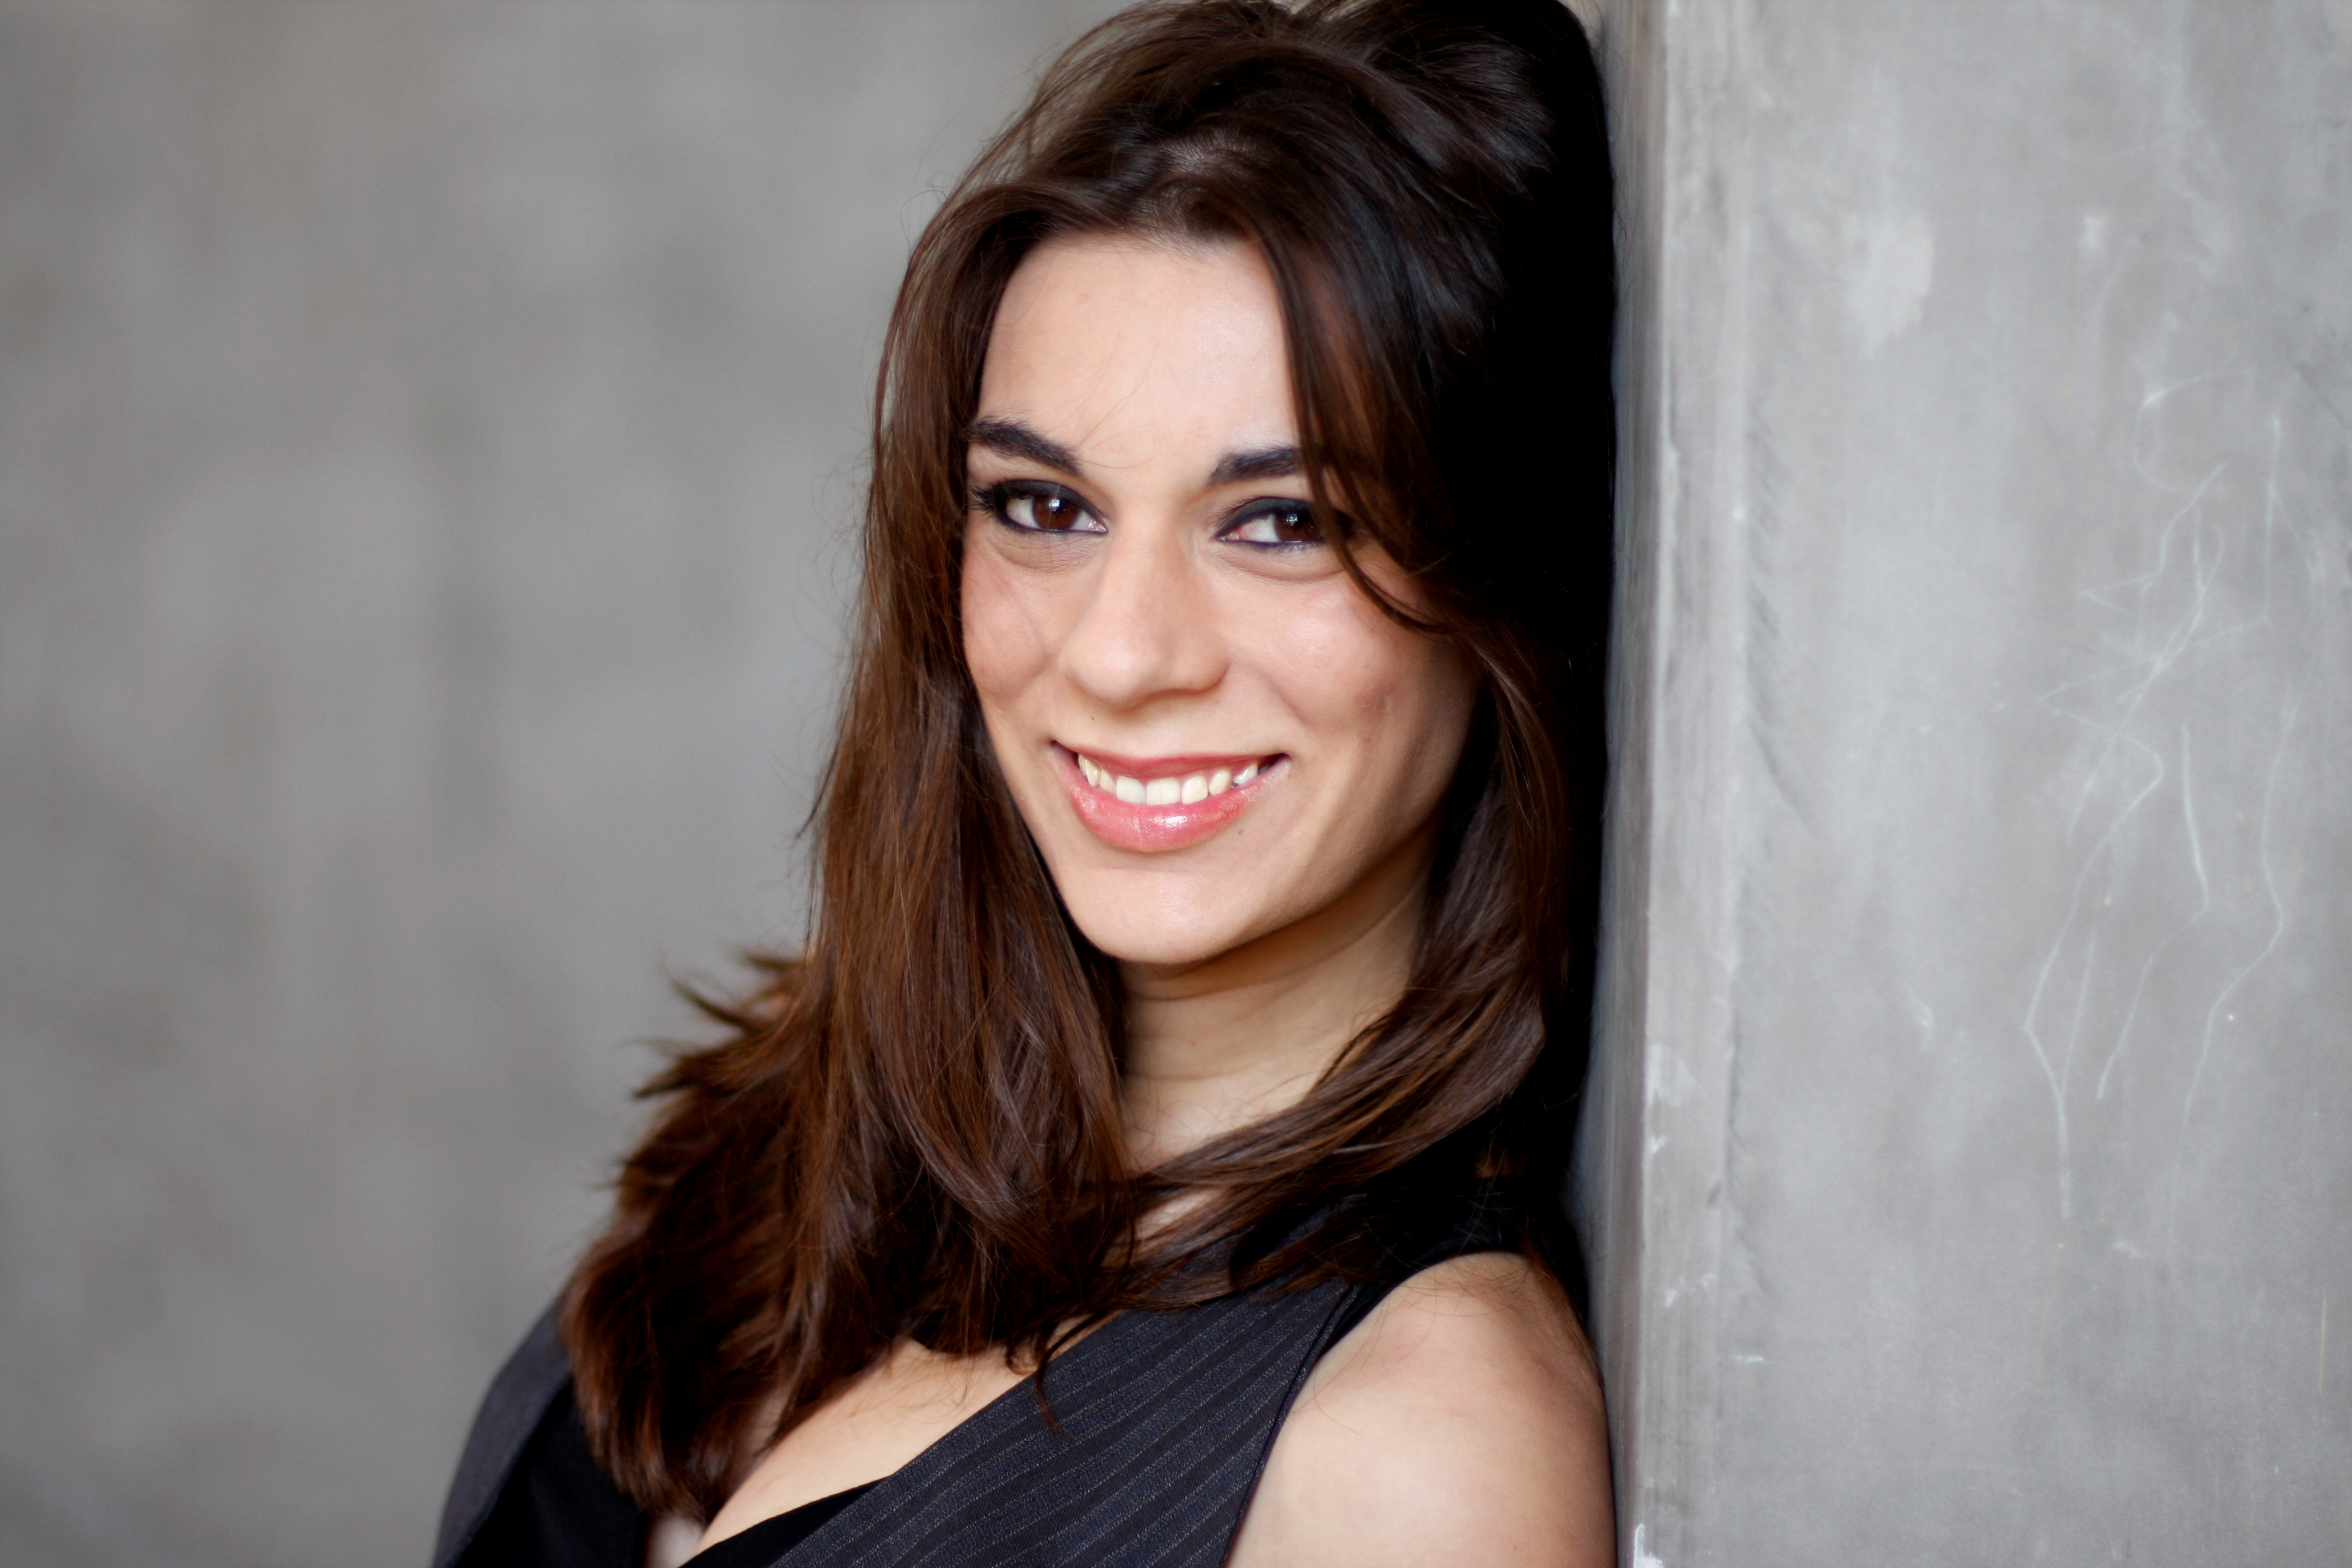 Kristina Teves